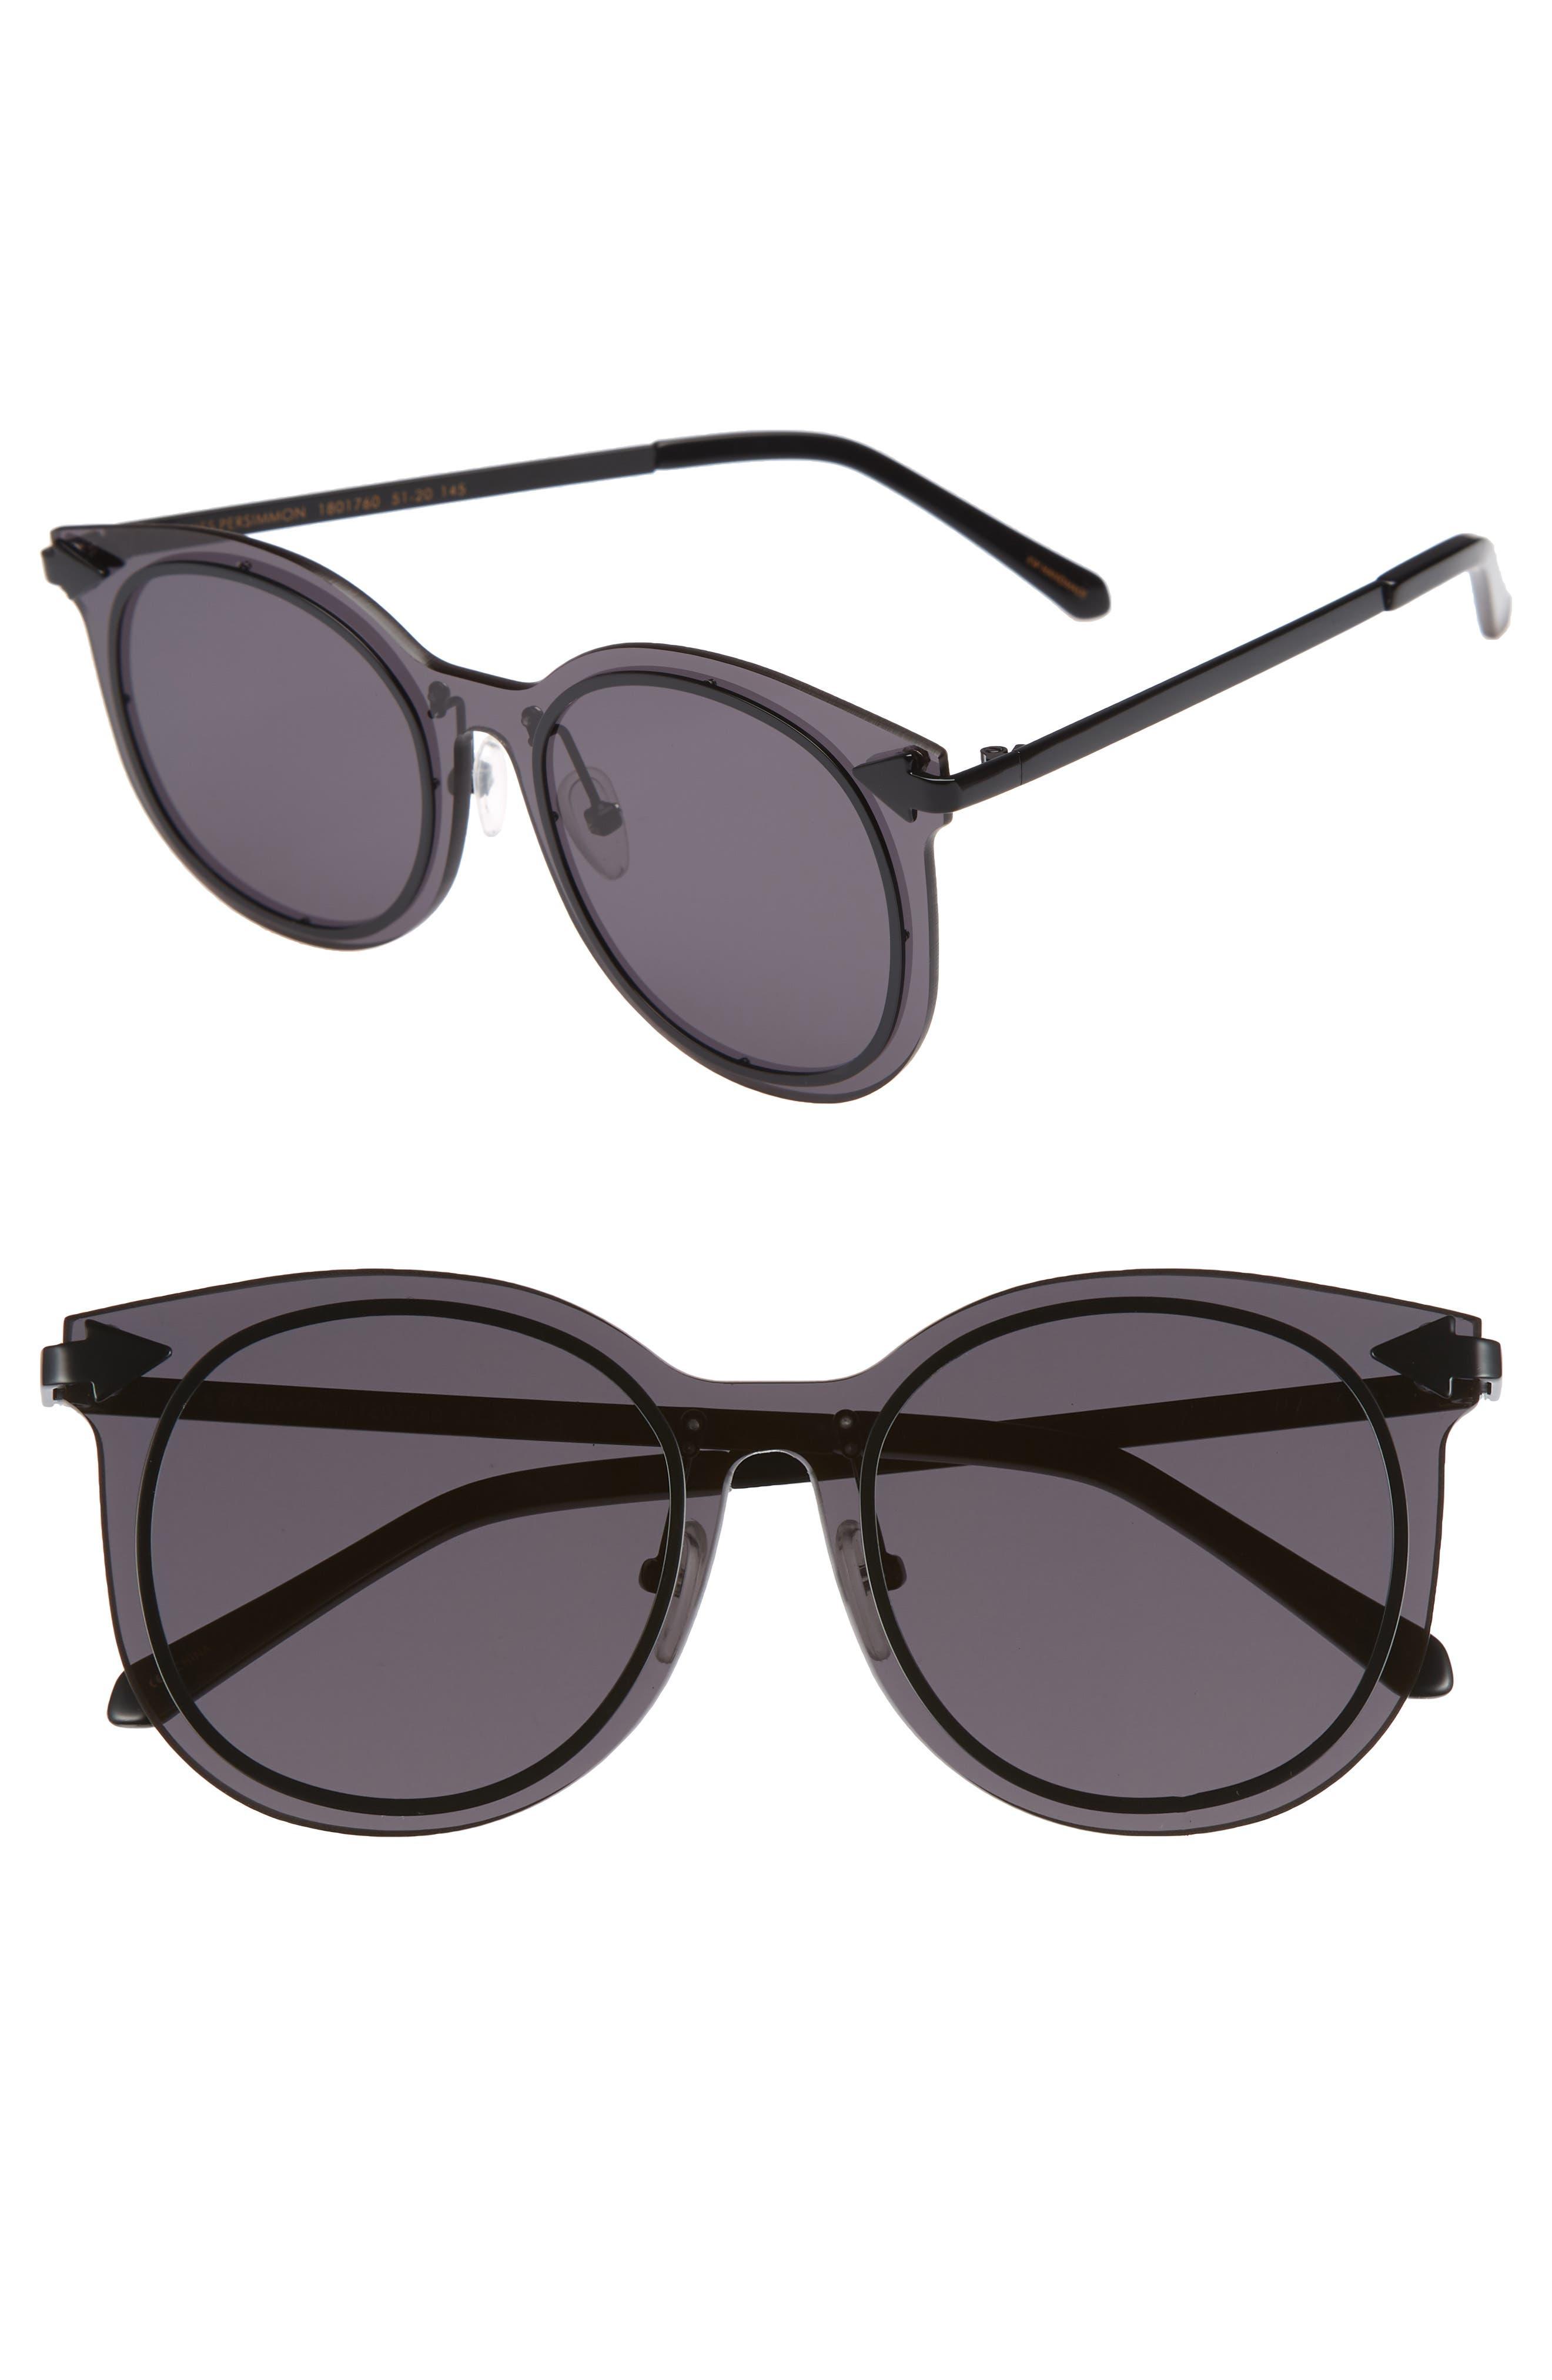 Miss Persimmon 51mm Sunglasses,                             Main thumbnail 1, color,                             Black